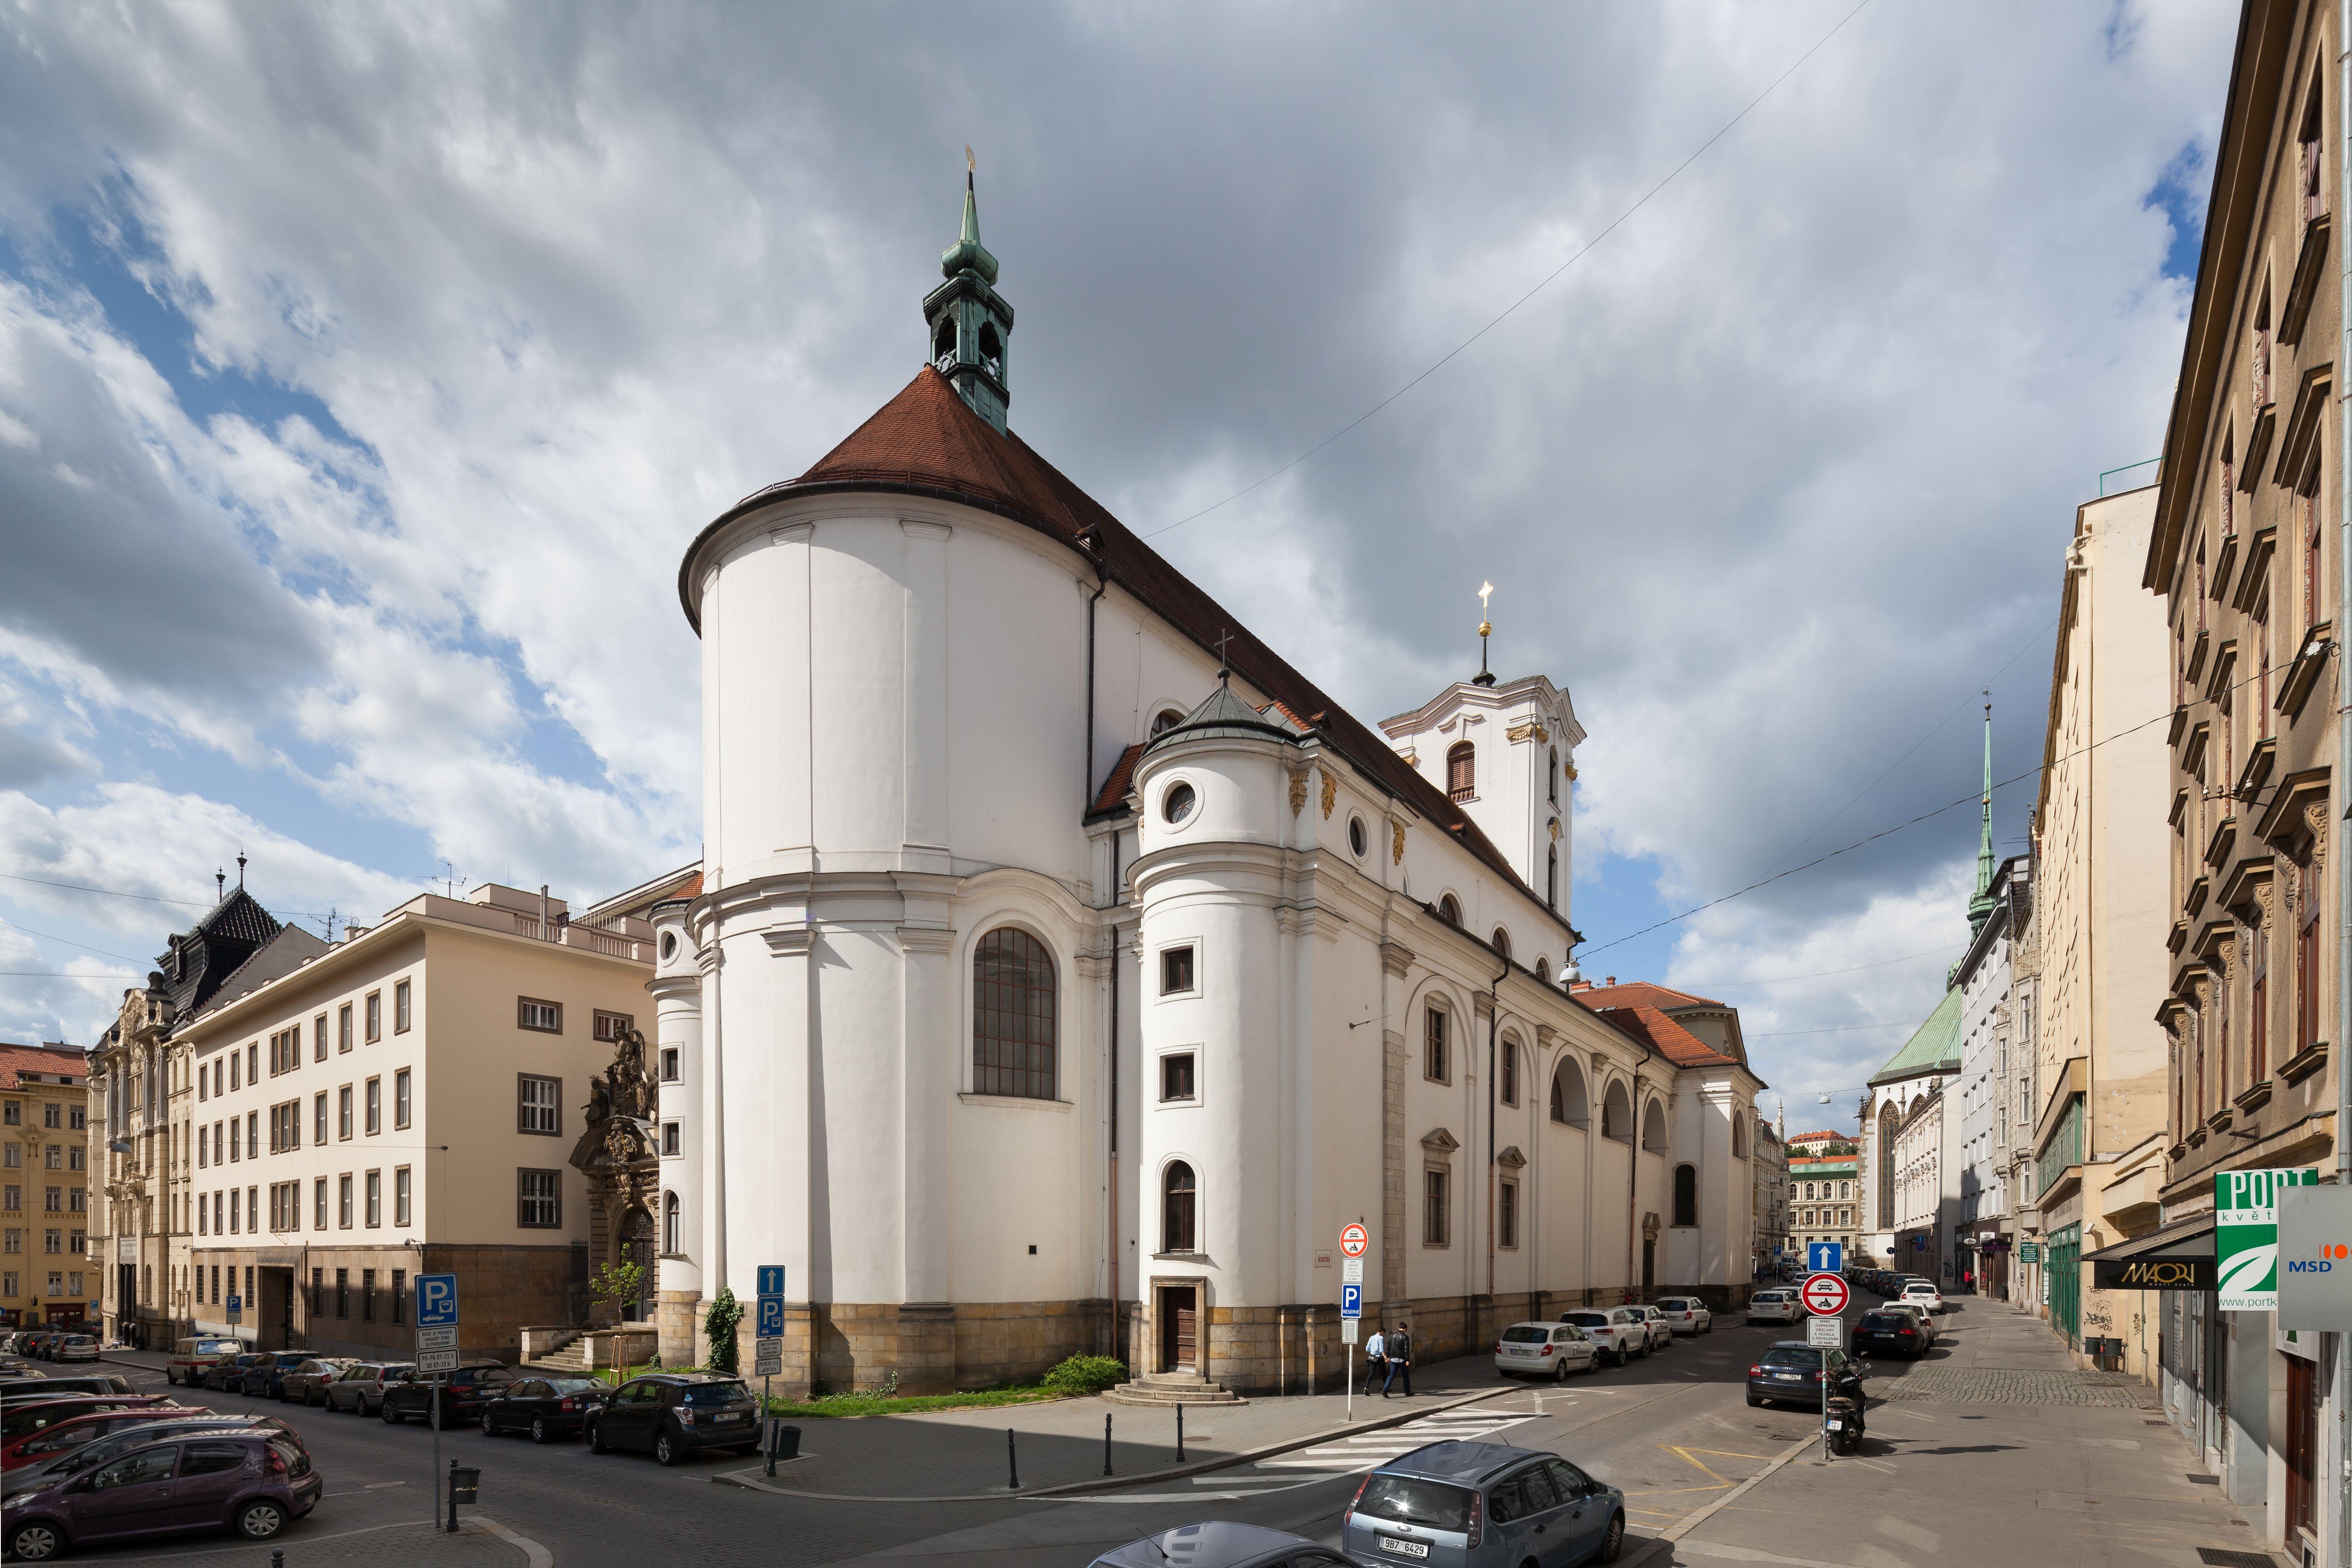 Church of the Assumption of Virgin Mary (Kostel Nanebevzetí Panny Marie) in Brno